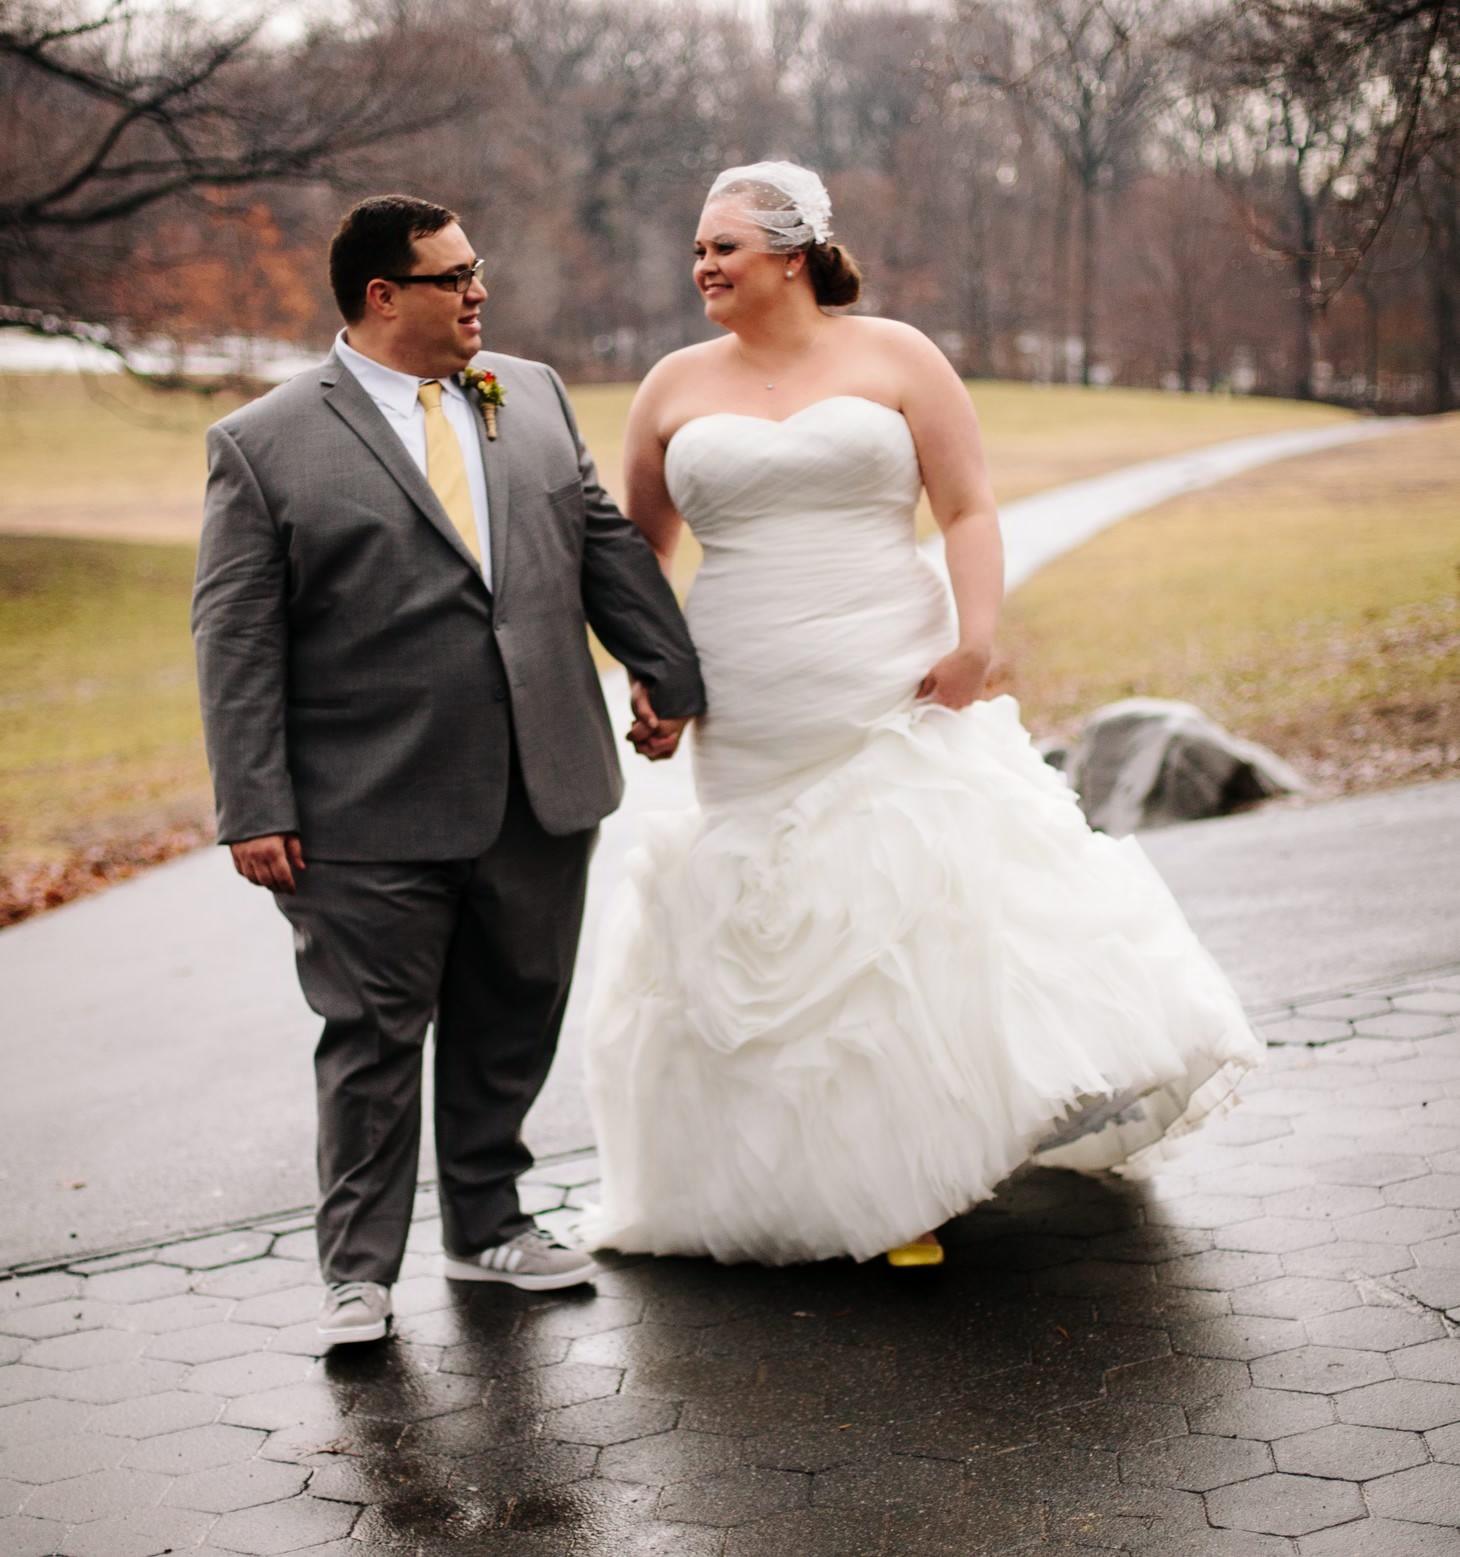 nyc-brooklyn-prospect-park-picnic-house-wedding-smitten-chickens-nerdy-26.jpg